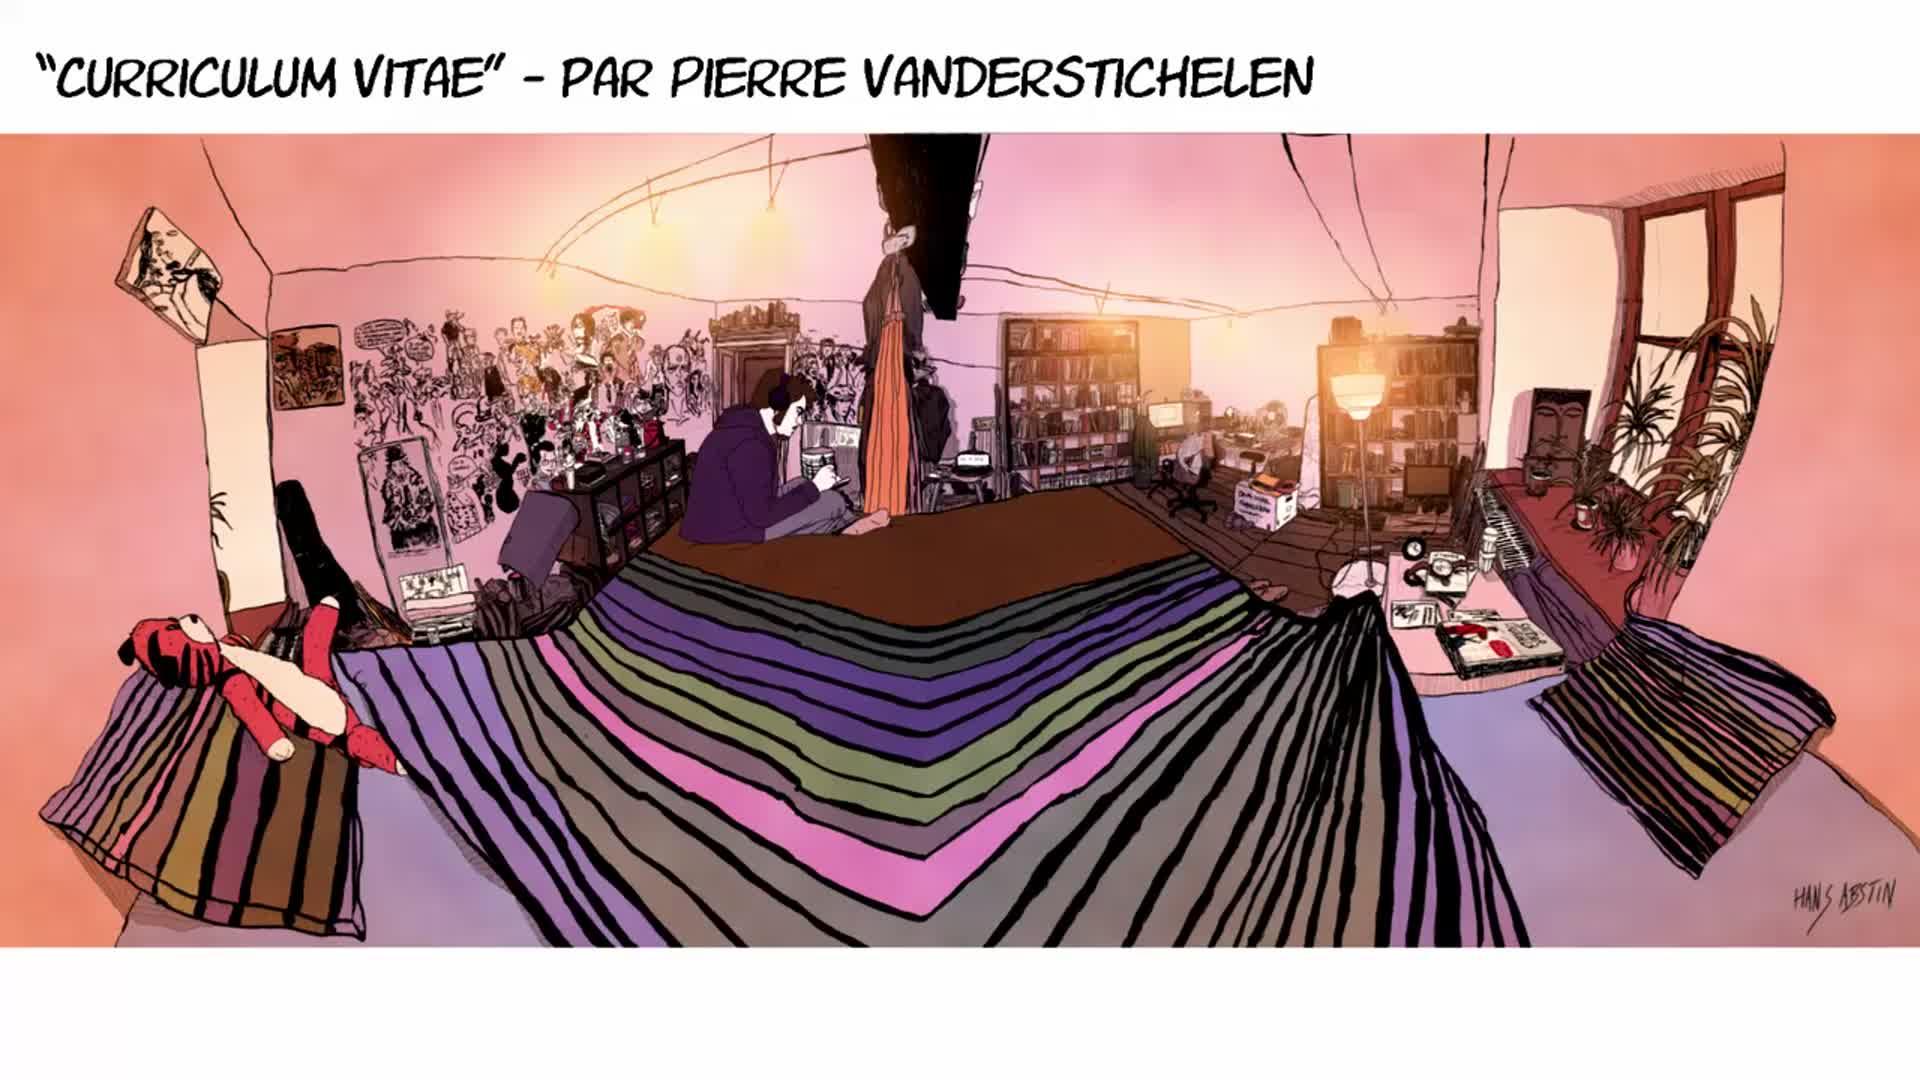 Cover Letter And Resume Motion Design And Comics Pierre Vanderstichelen Artstation